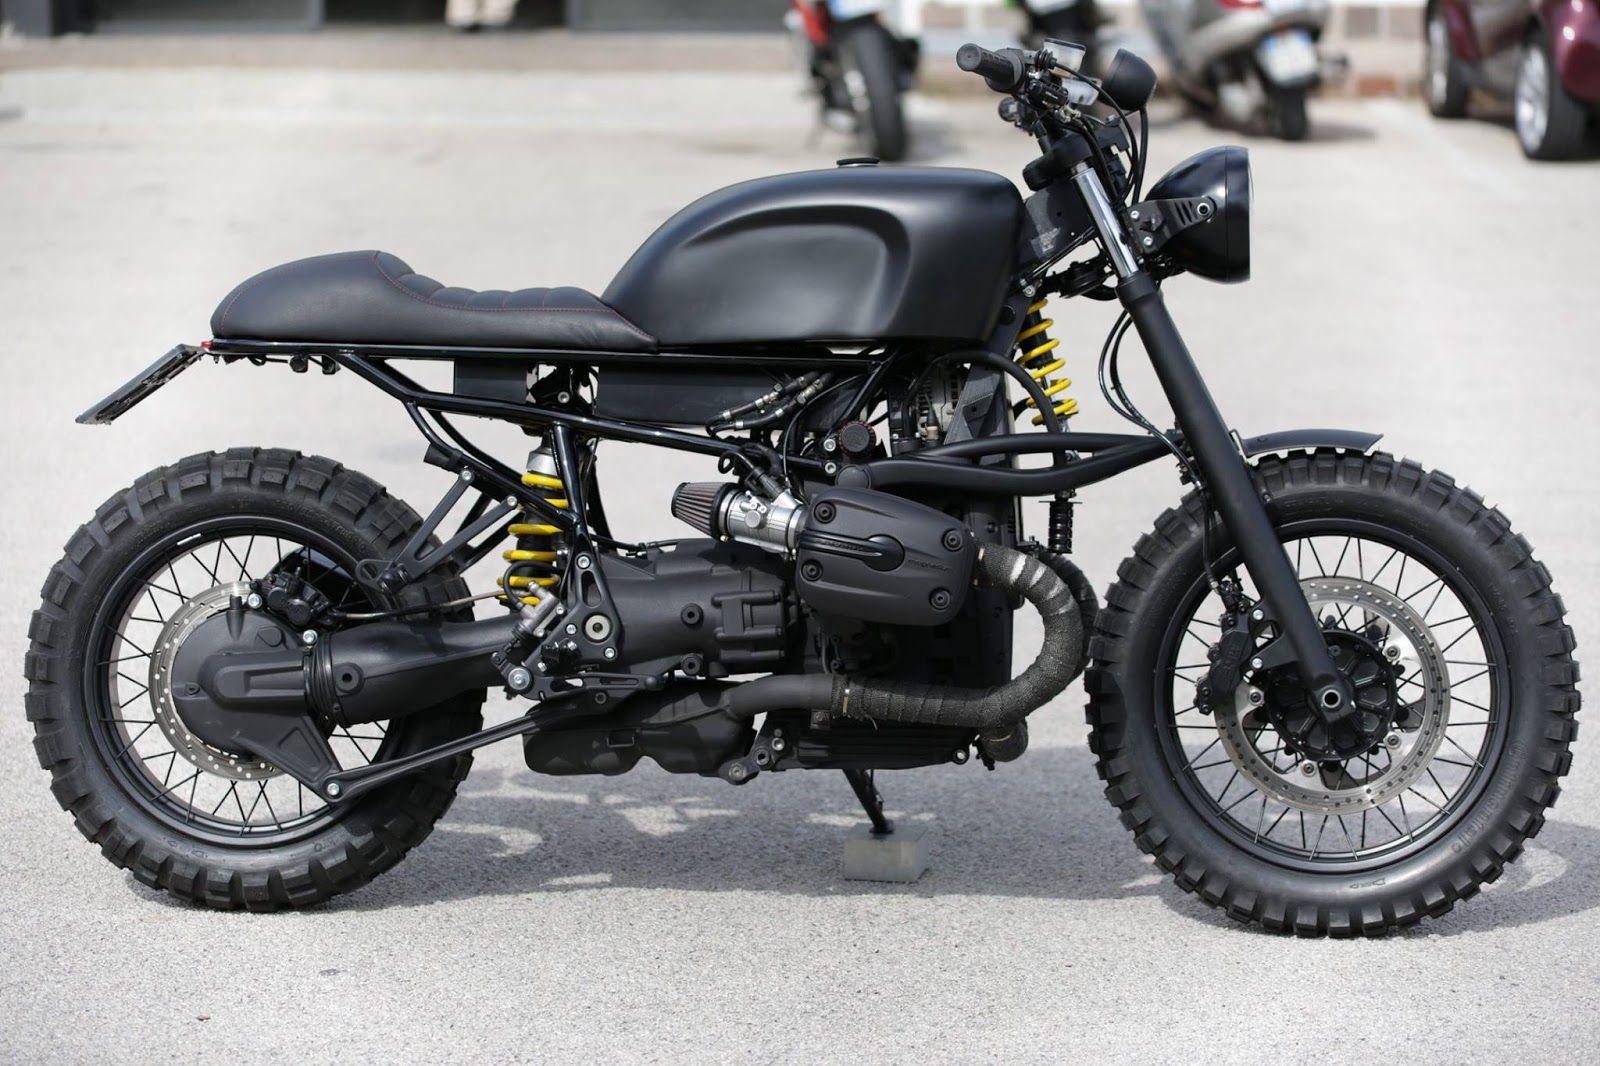 bmw cafe racercrn cafe racer napoli | bmw custom motorcycles